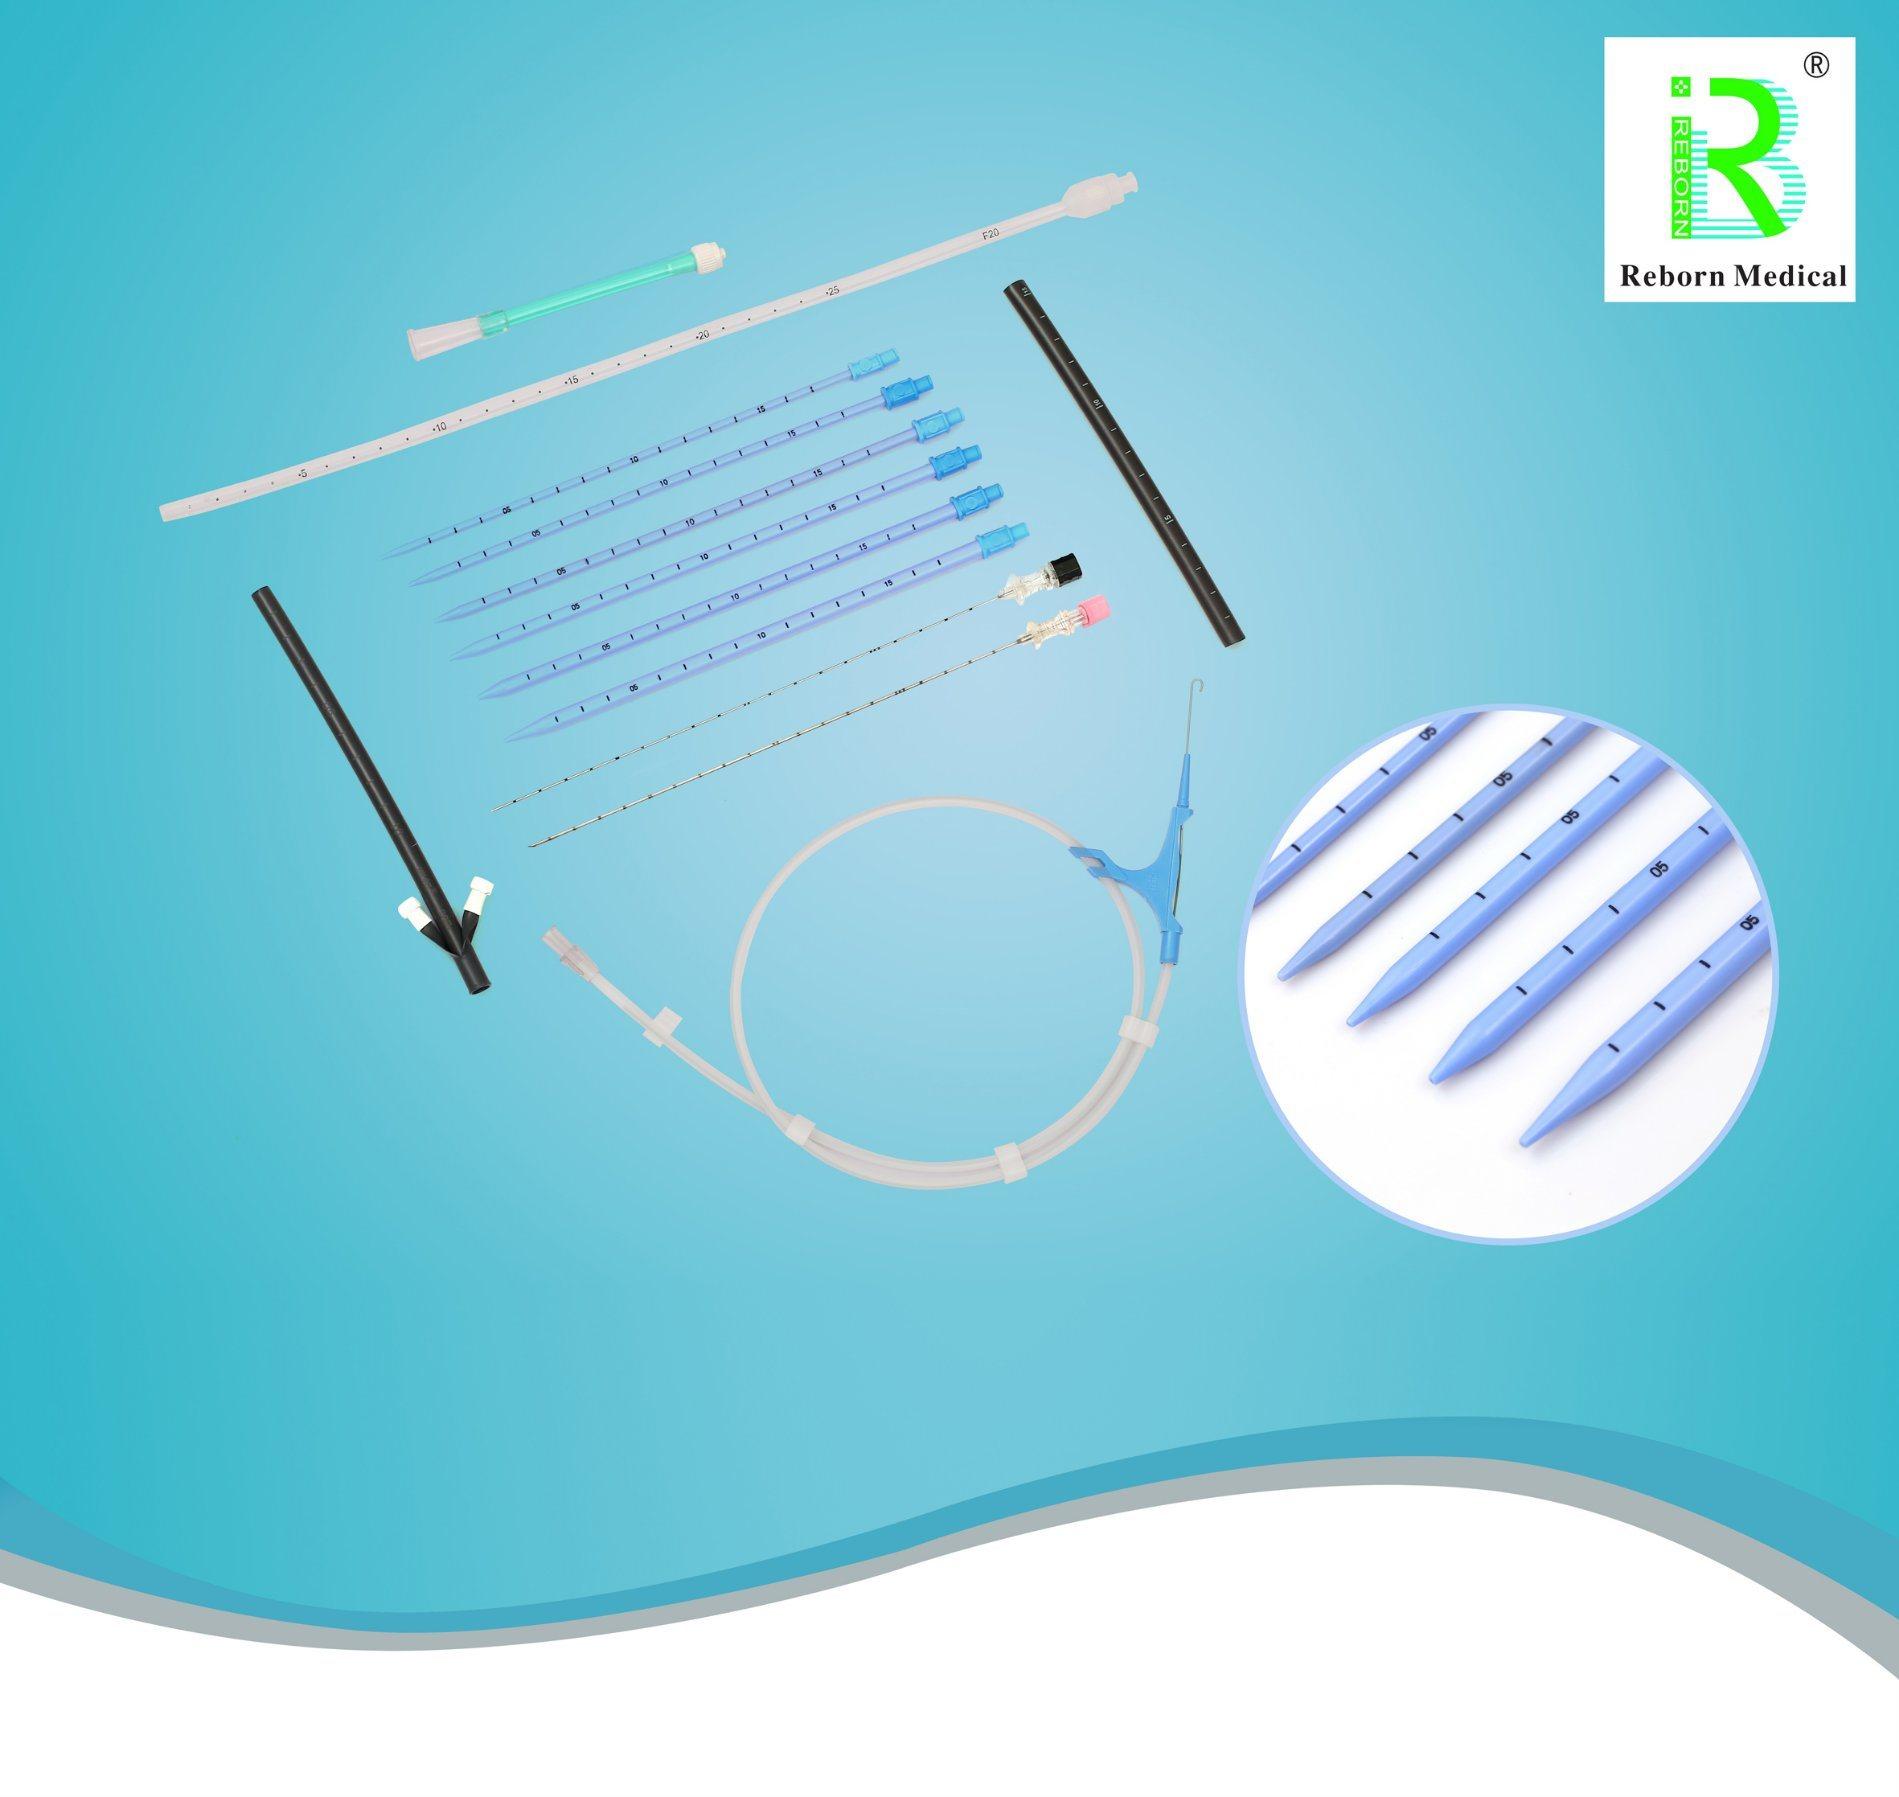 Urology Disposable Percutaneous Nephrostomy Catheter